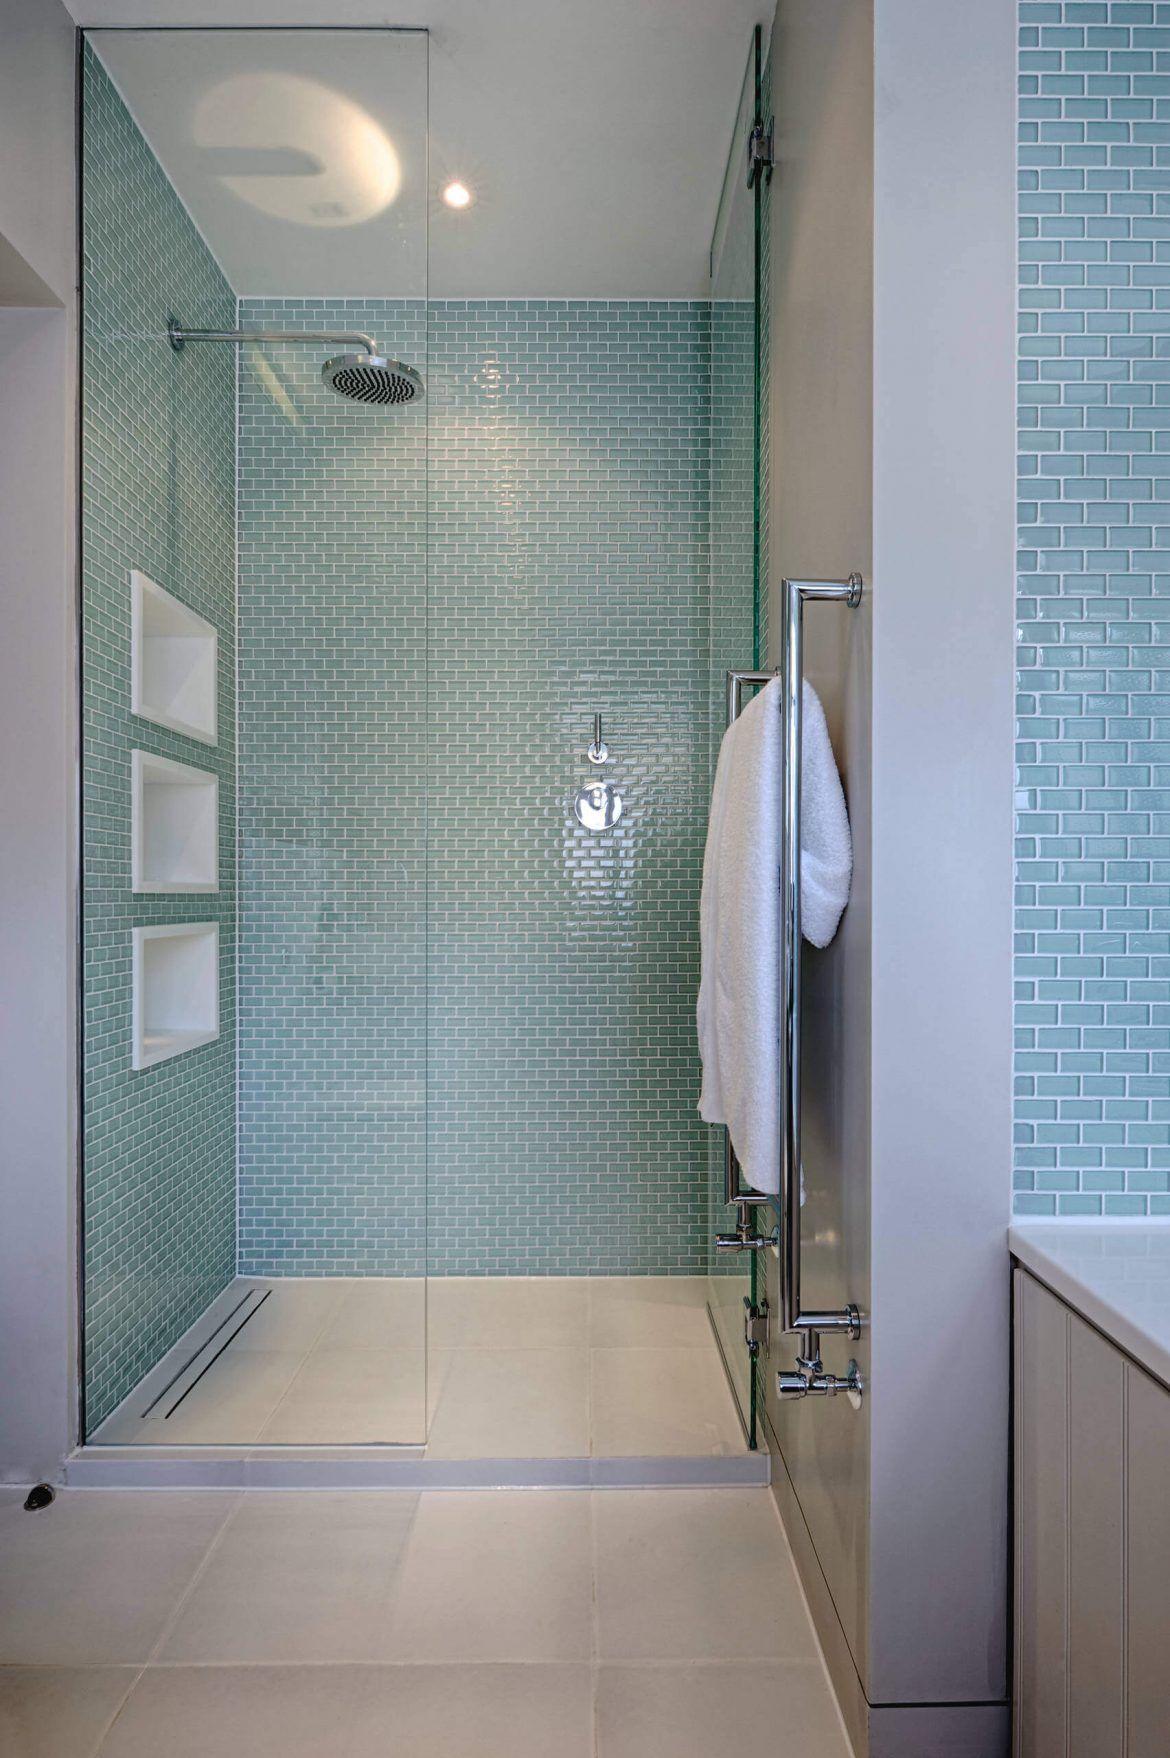 43+ Shower design ideas 2020 ideas